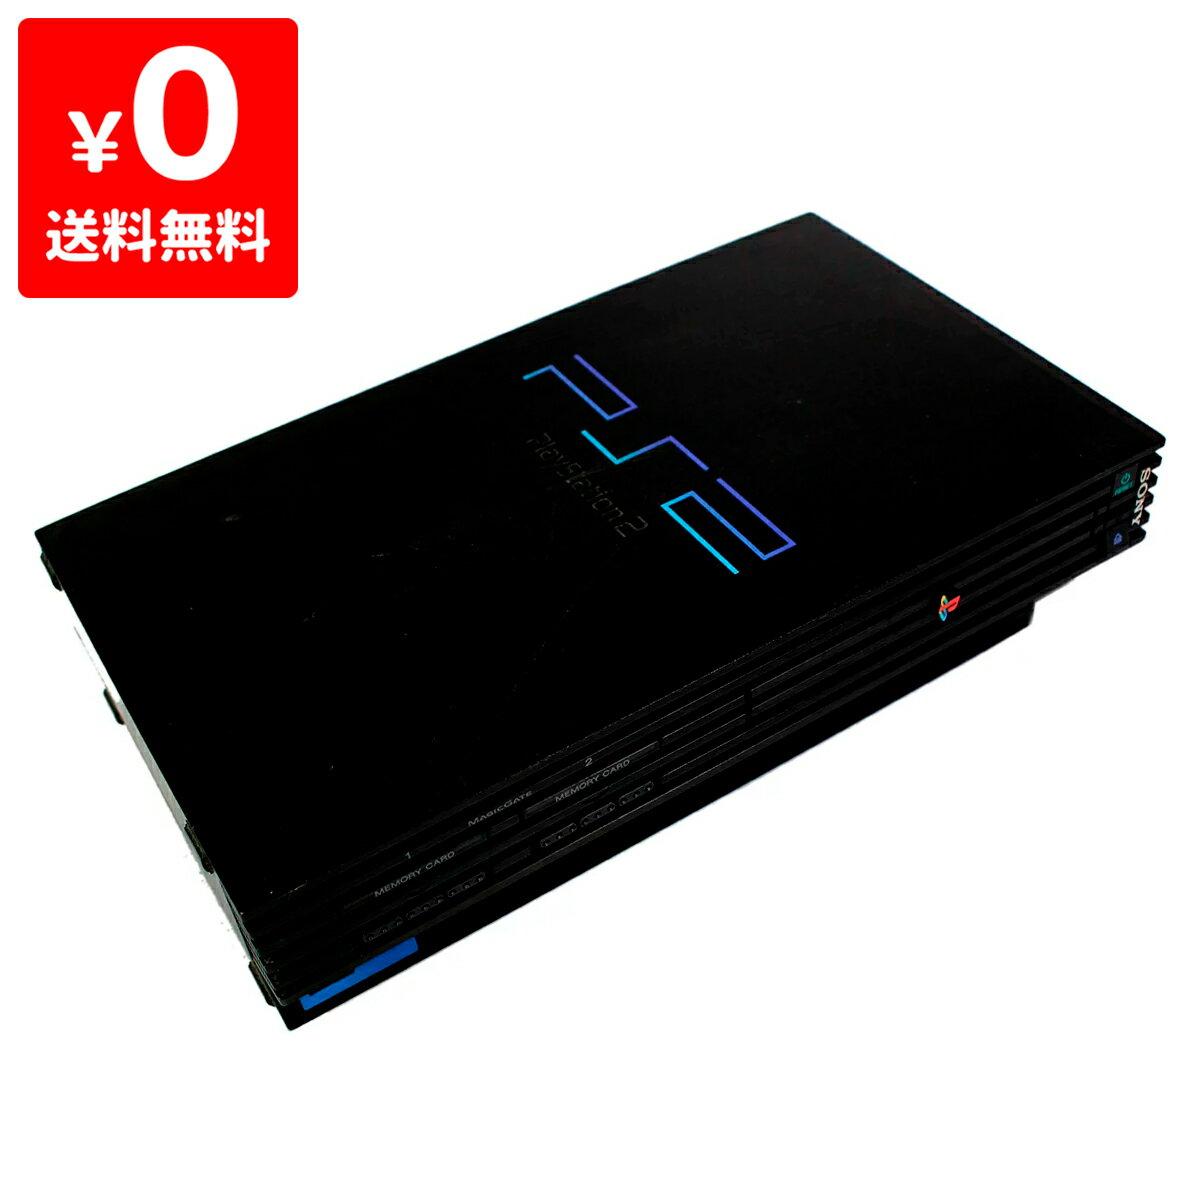 PS2 プレステ2 プレイステーション2 (SCPH-30000) 本体のみ 本体単品 PlayStation2 SONY ソニー 中古 4948872300001 送料無料 【中古】